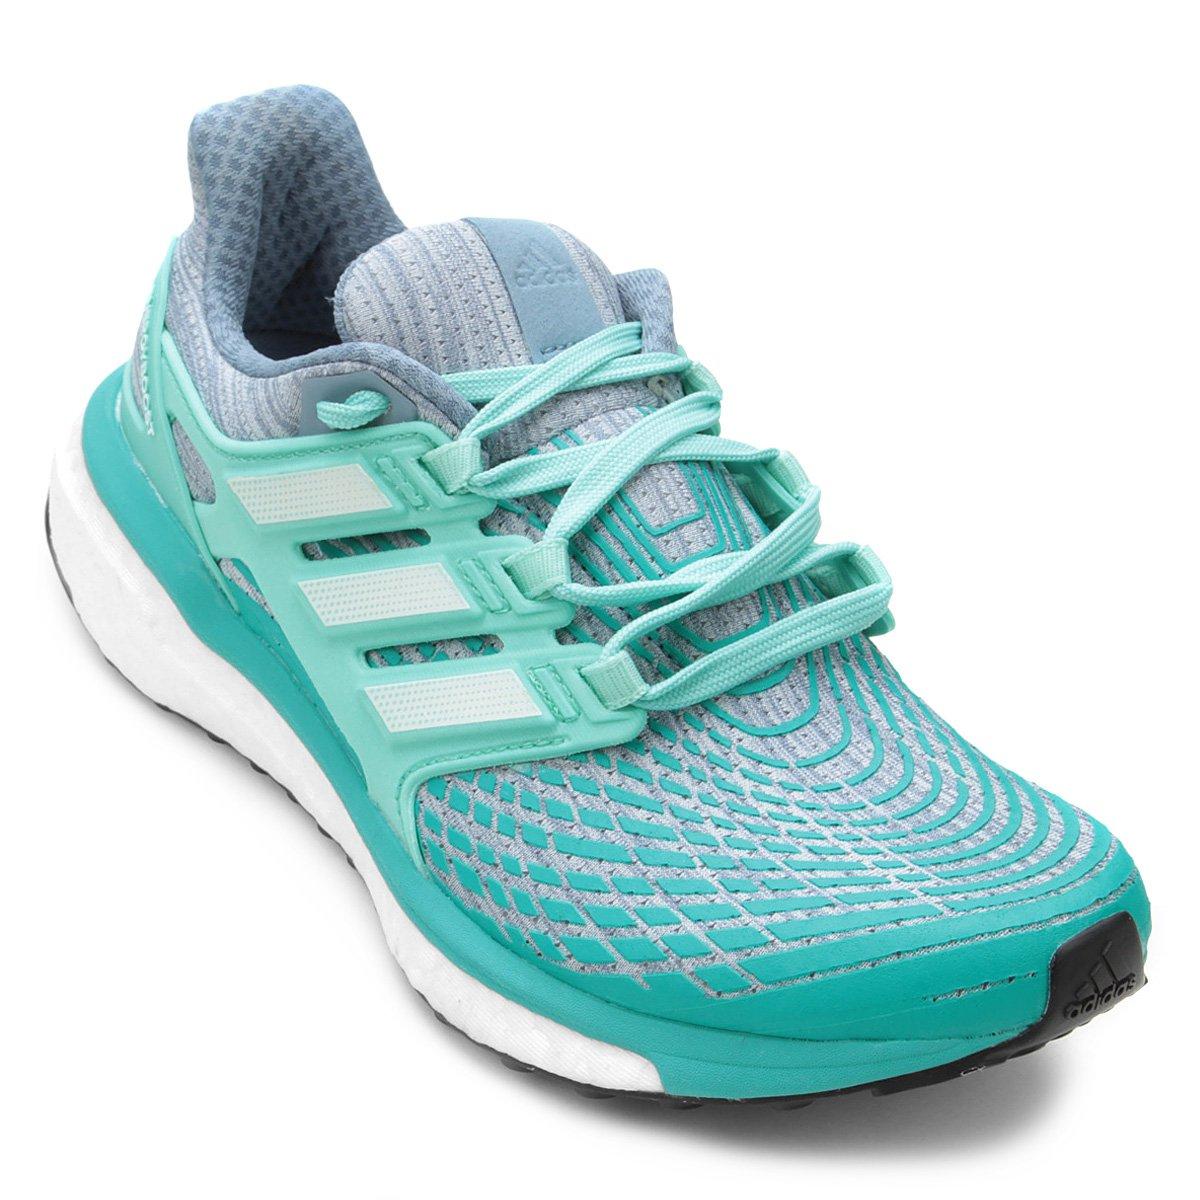 218f19731 Tênis Adidas Energy Boost Feminino. undefined